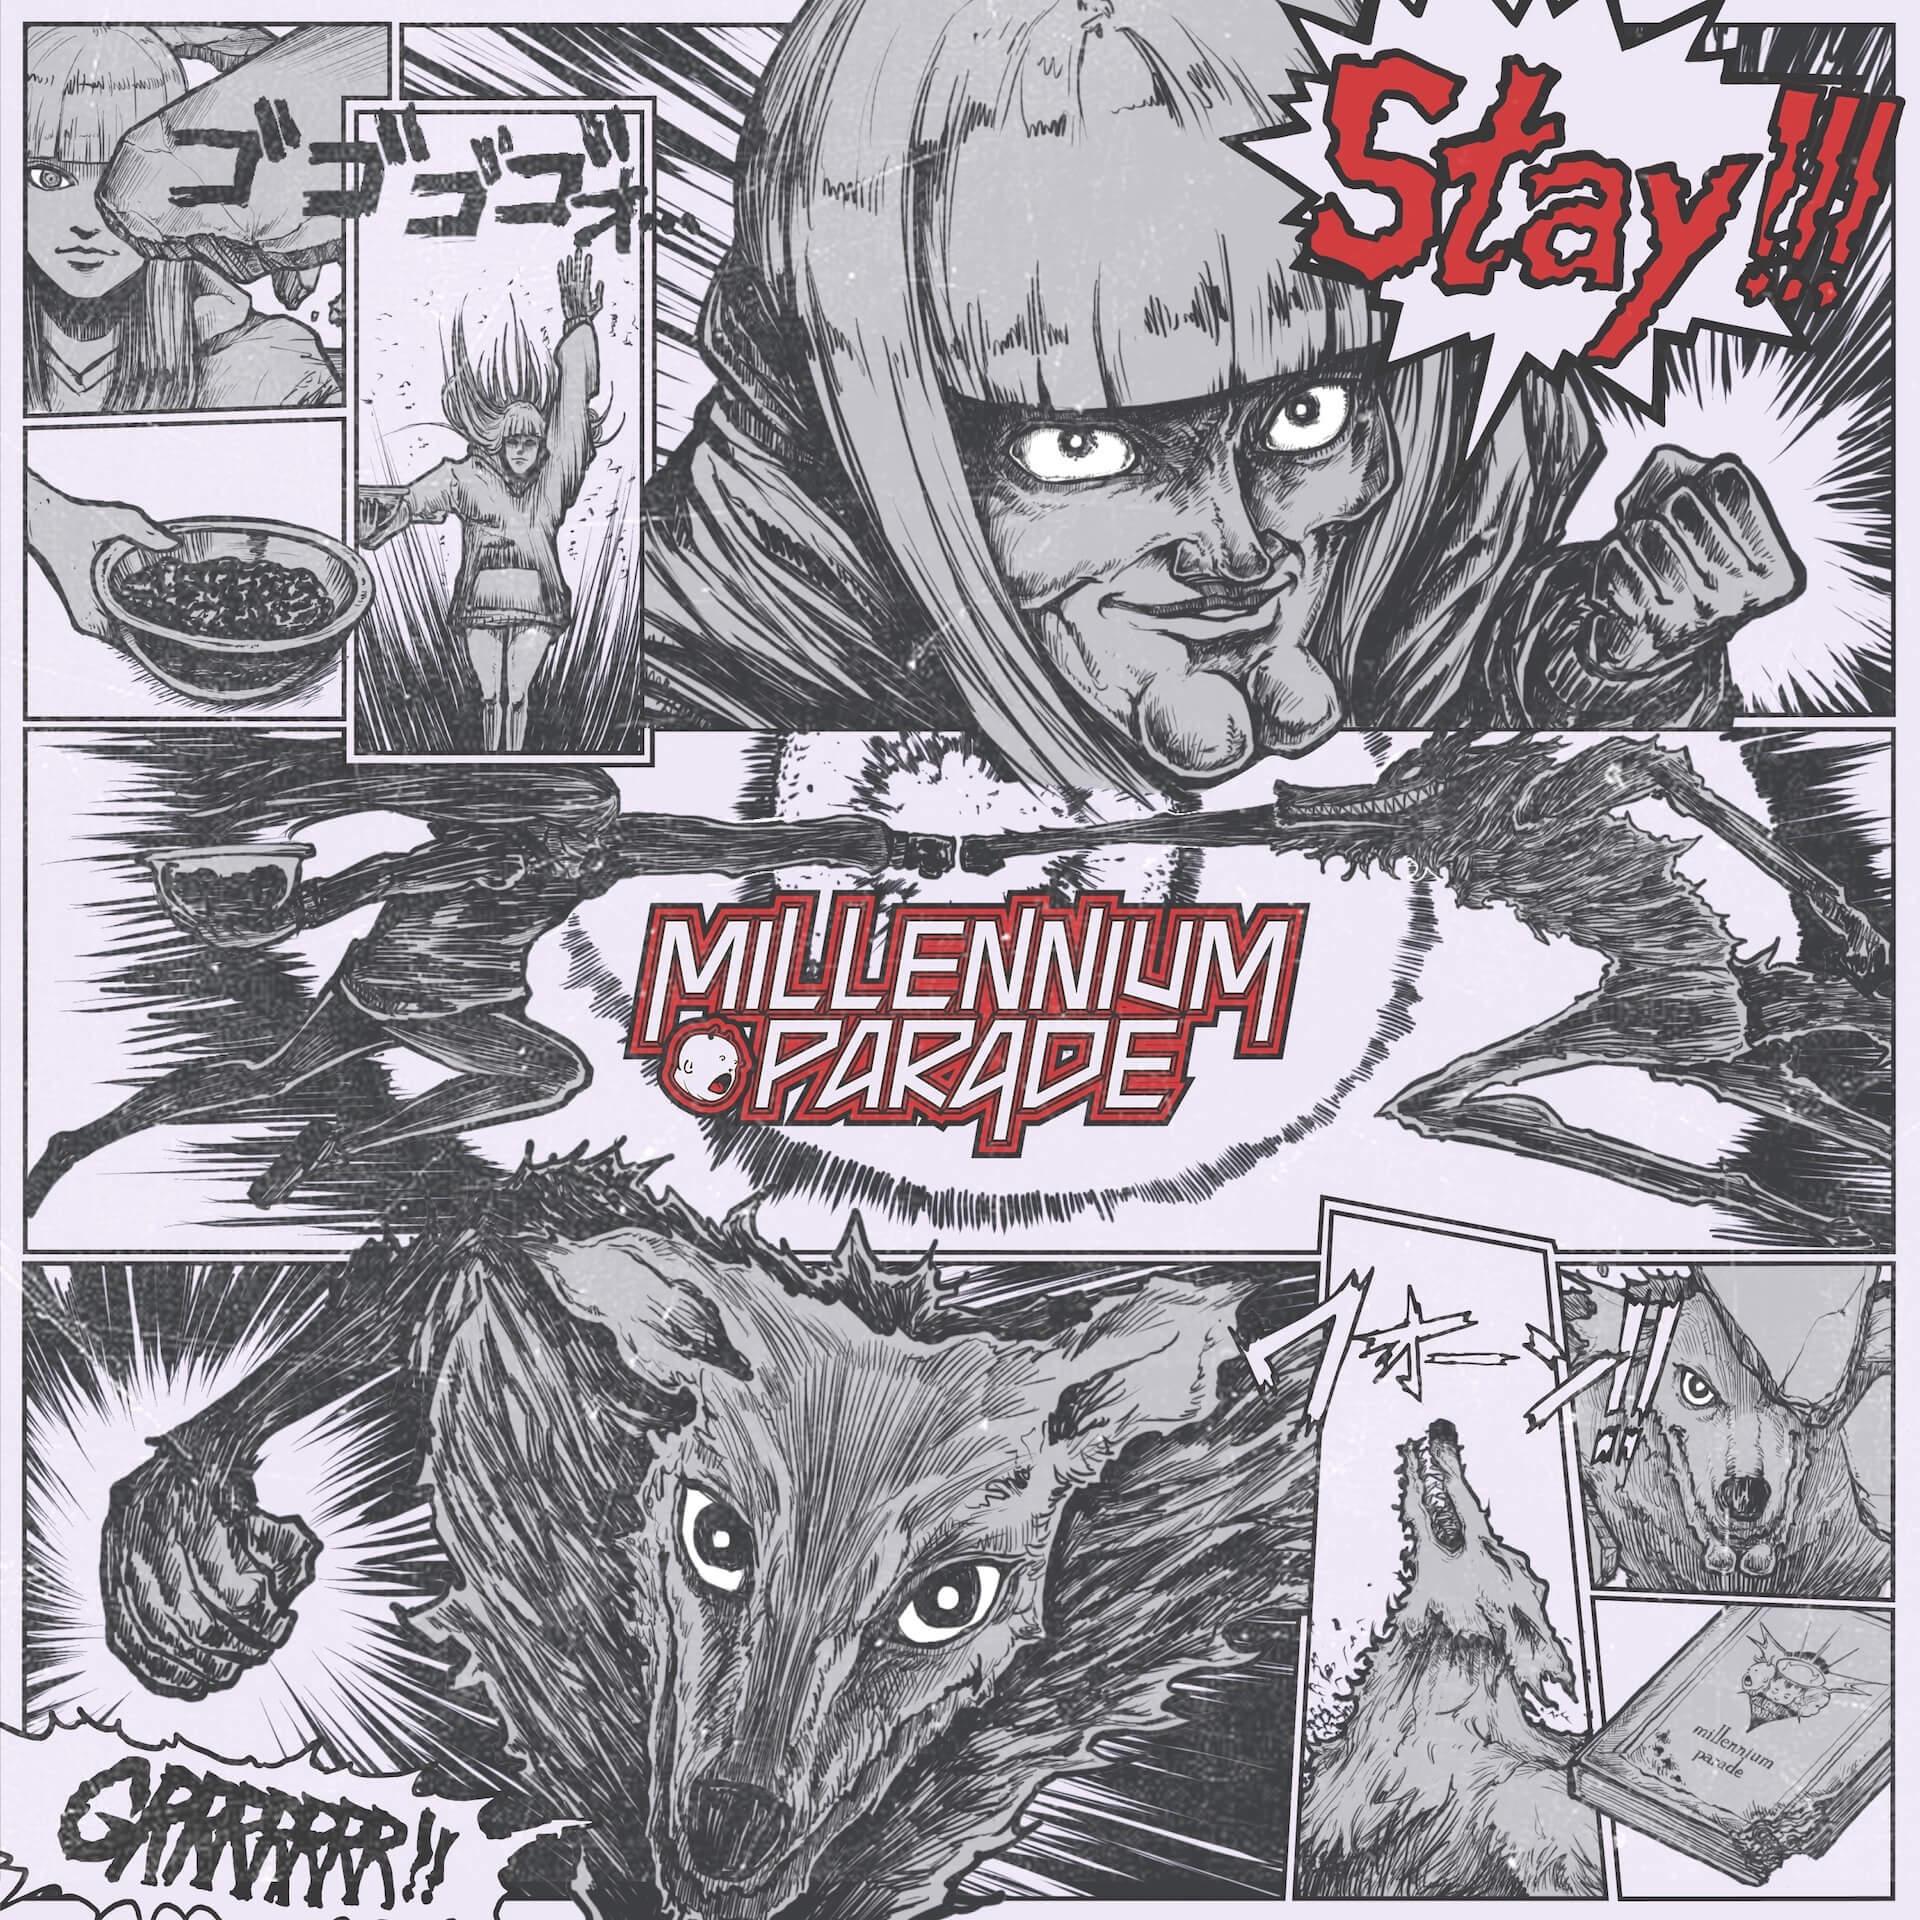 King Gnu常田大希ソロプロジェクト・millennium parade、Charaとの共作「Stay!!!」をリリース|MVも公開 music190927_millenniumparade_1